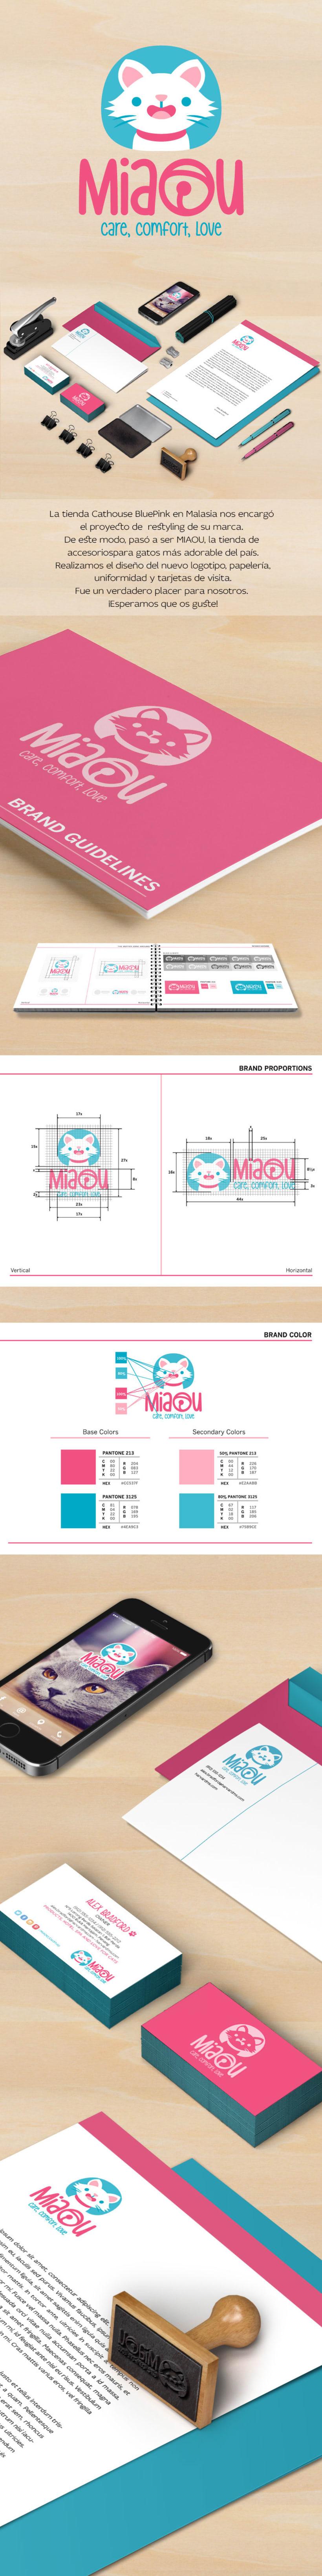 Restyling de la marca Miaou -1